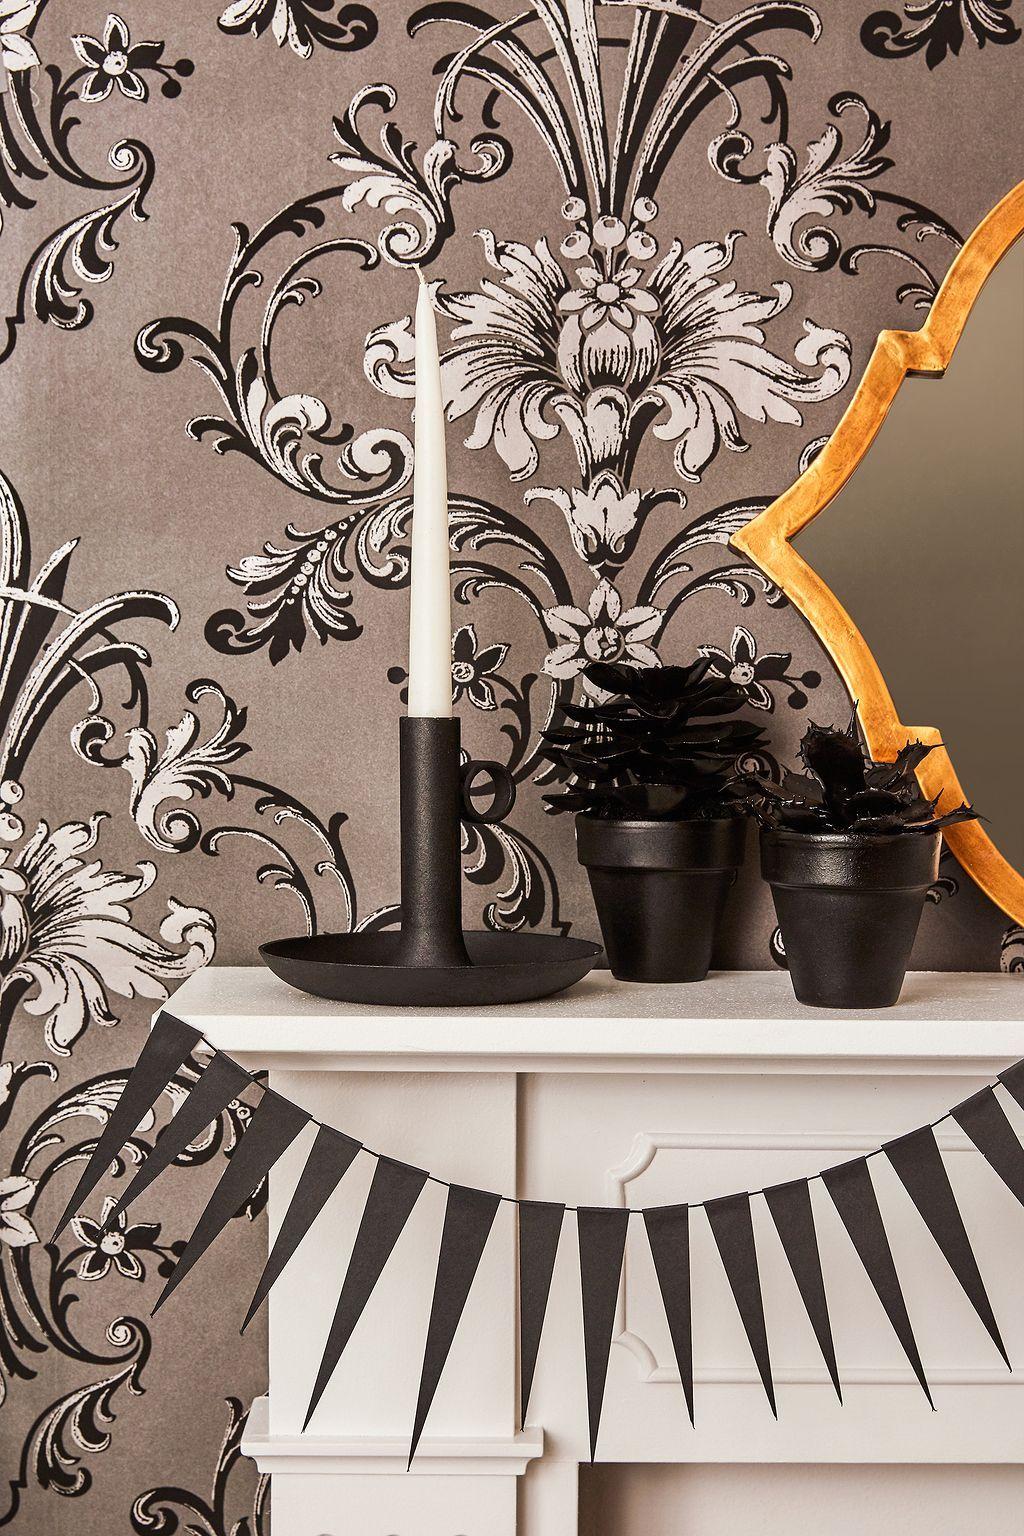 69 Halloween Decor Ideas for Your House House and Decorating - black and white halloween decorations